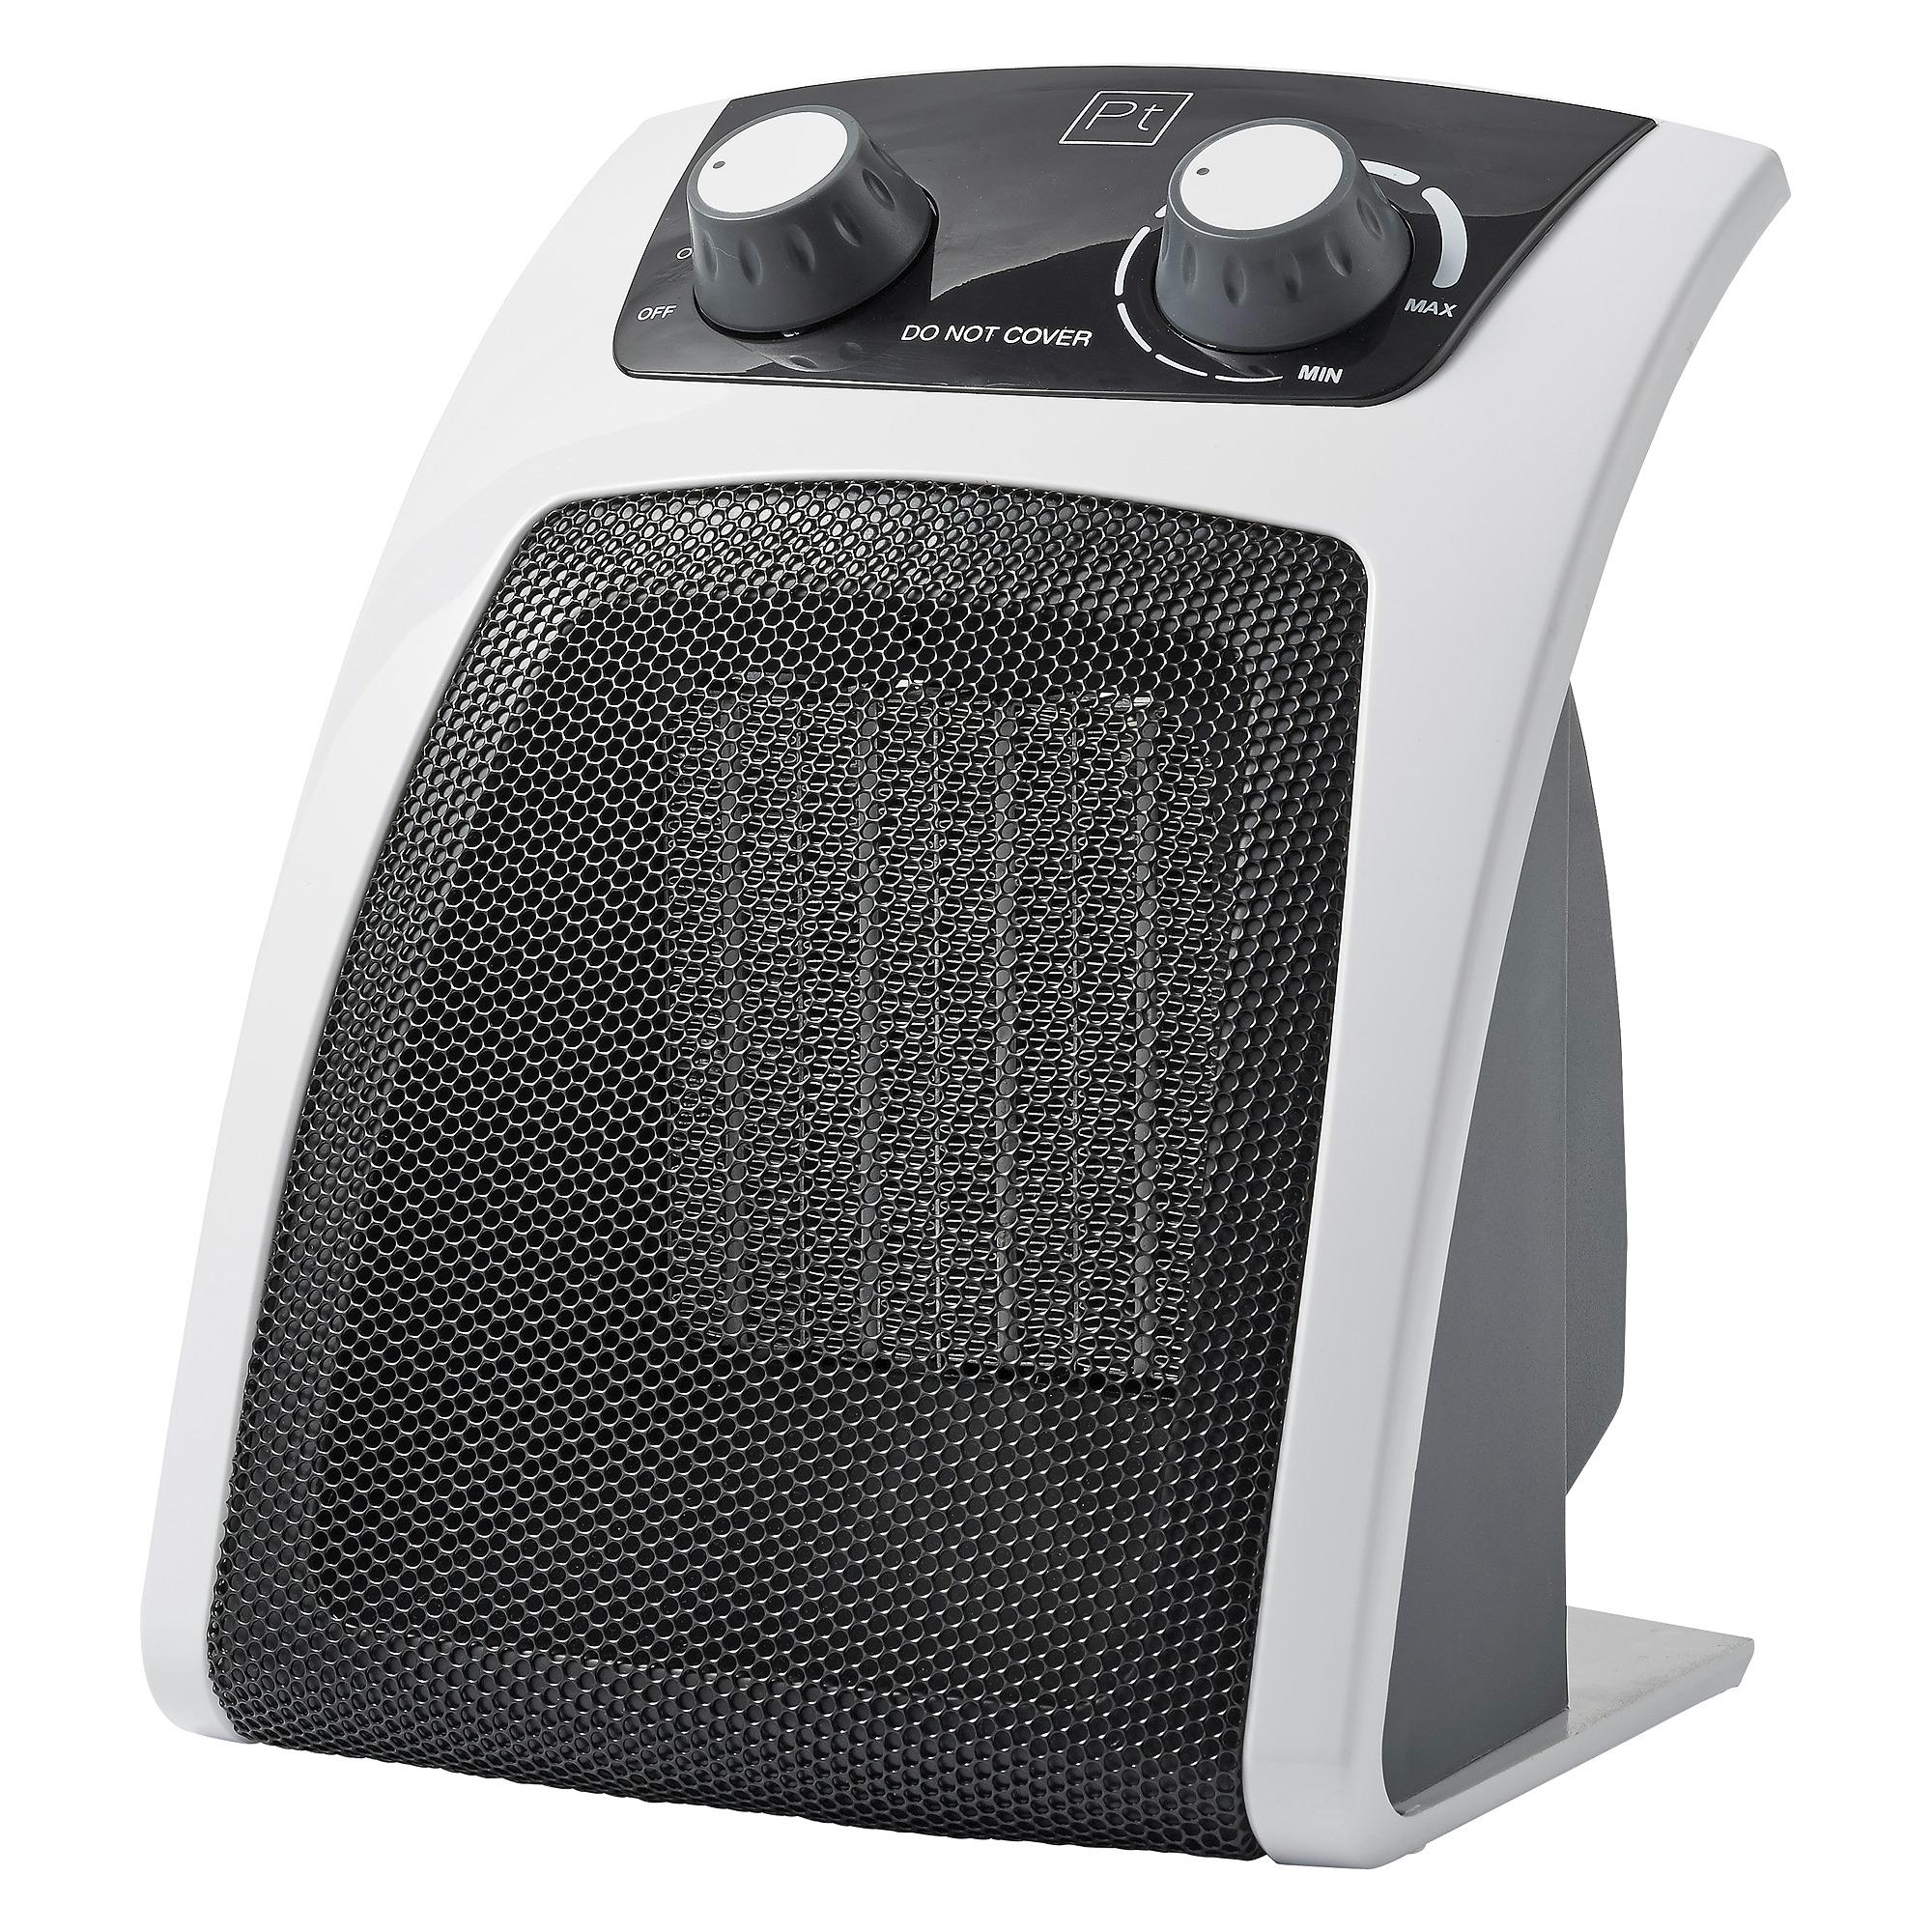 Handson ventilatorkachel 2000W 25,8x20 cm